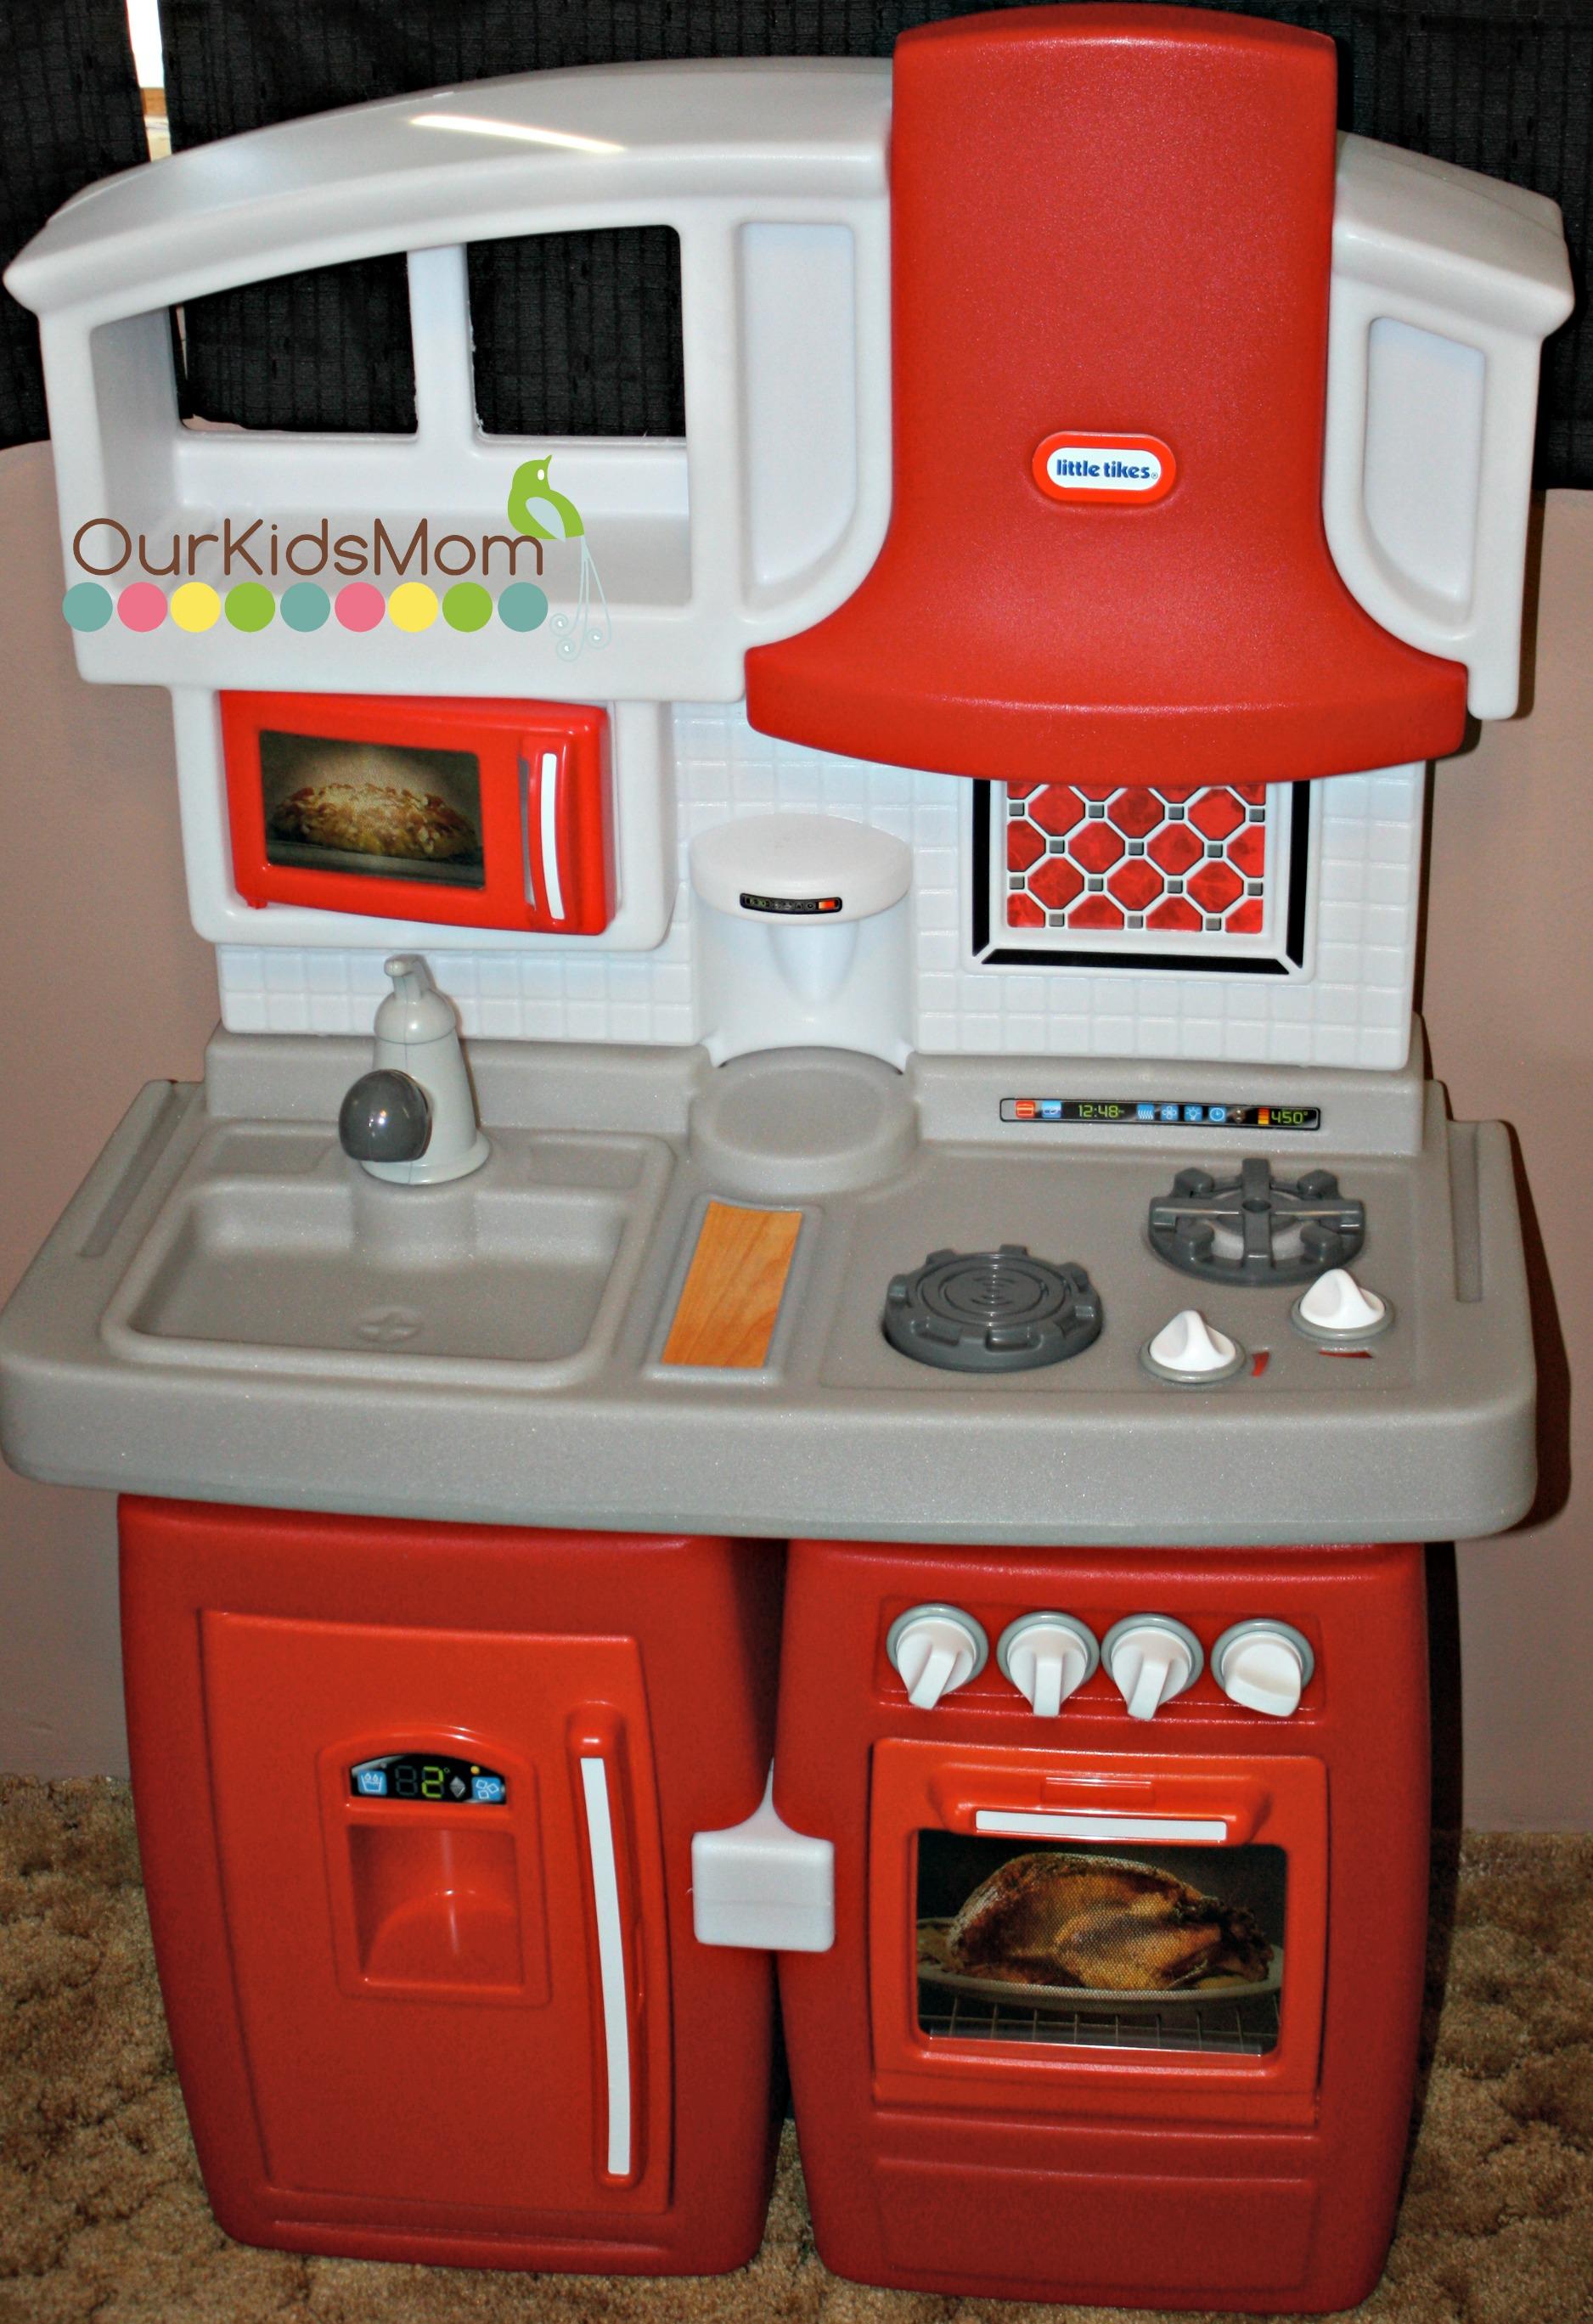 Little Tikes Cook n\' Grow Kitchen